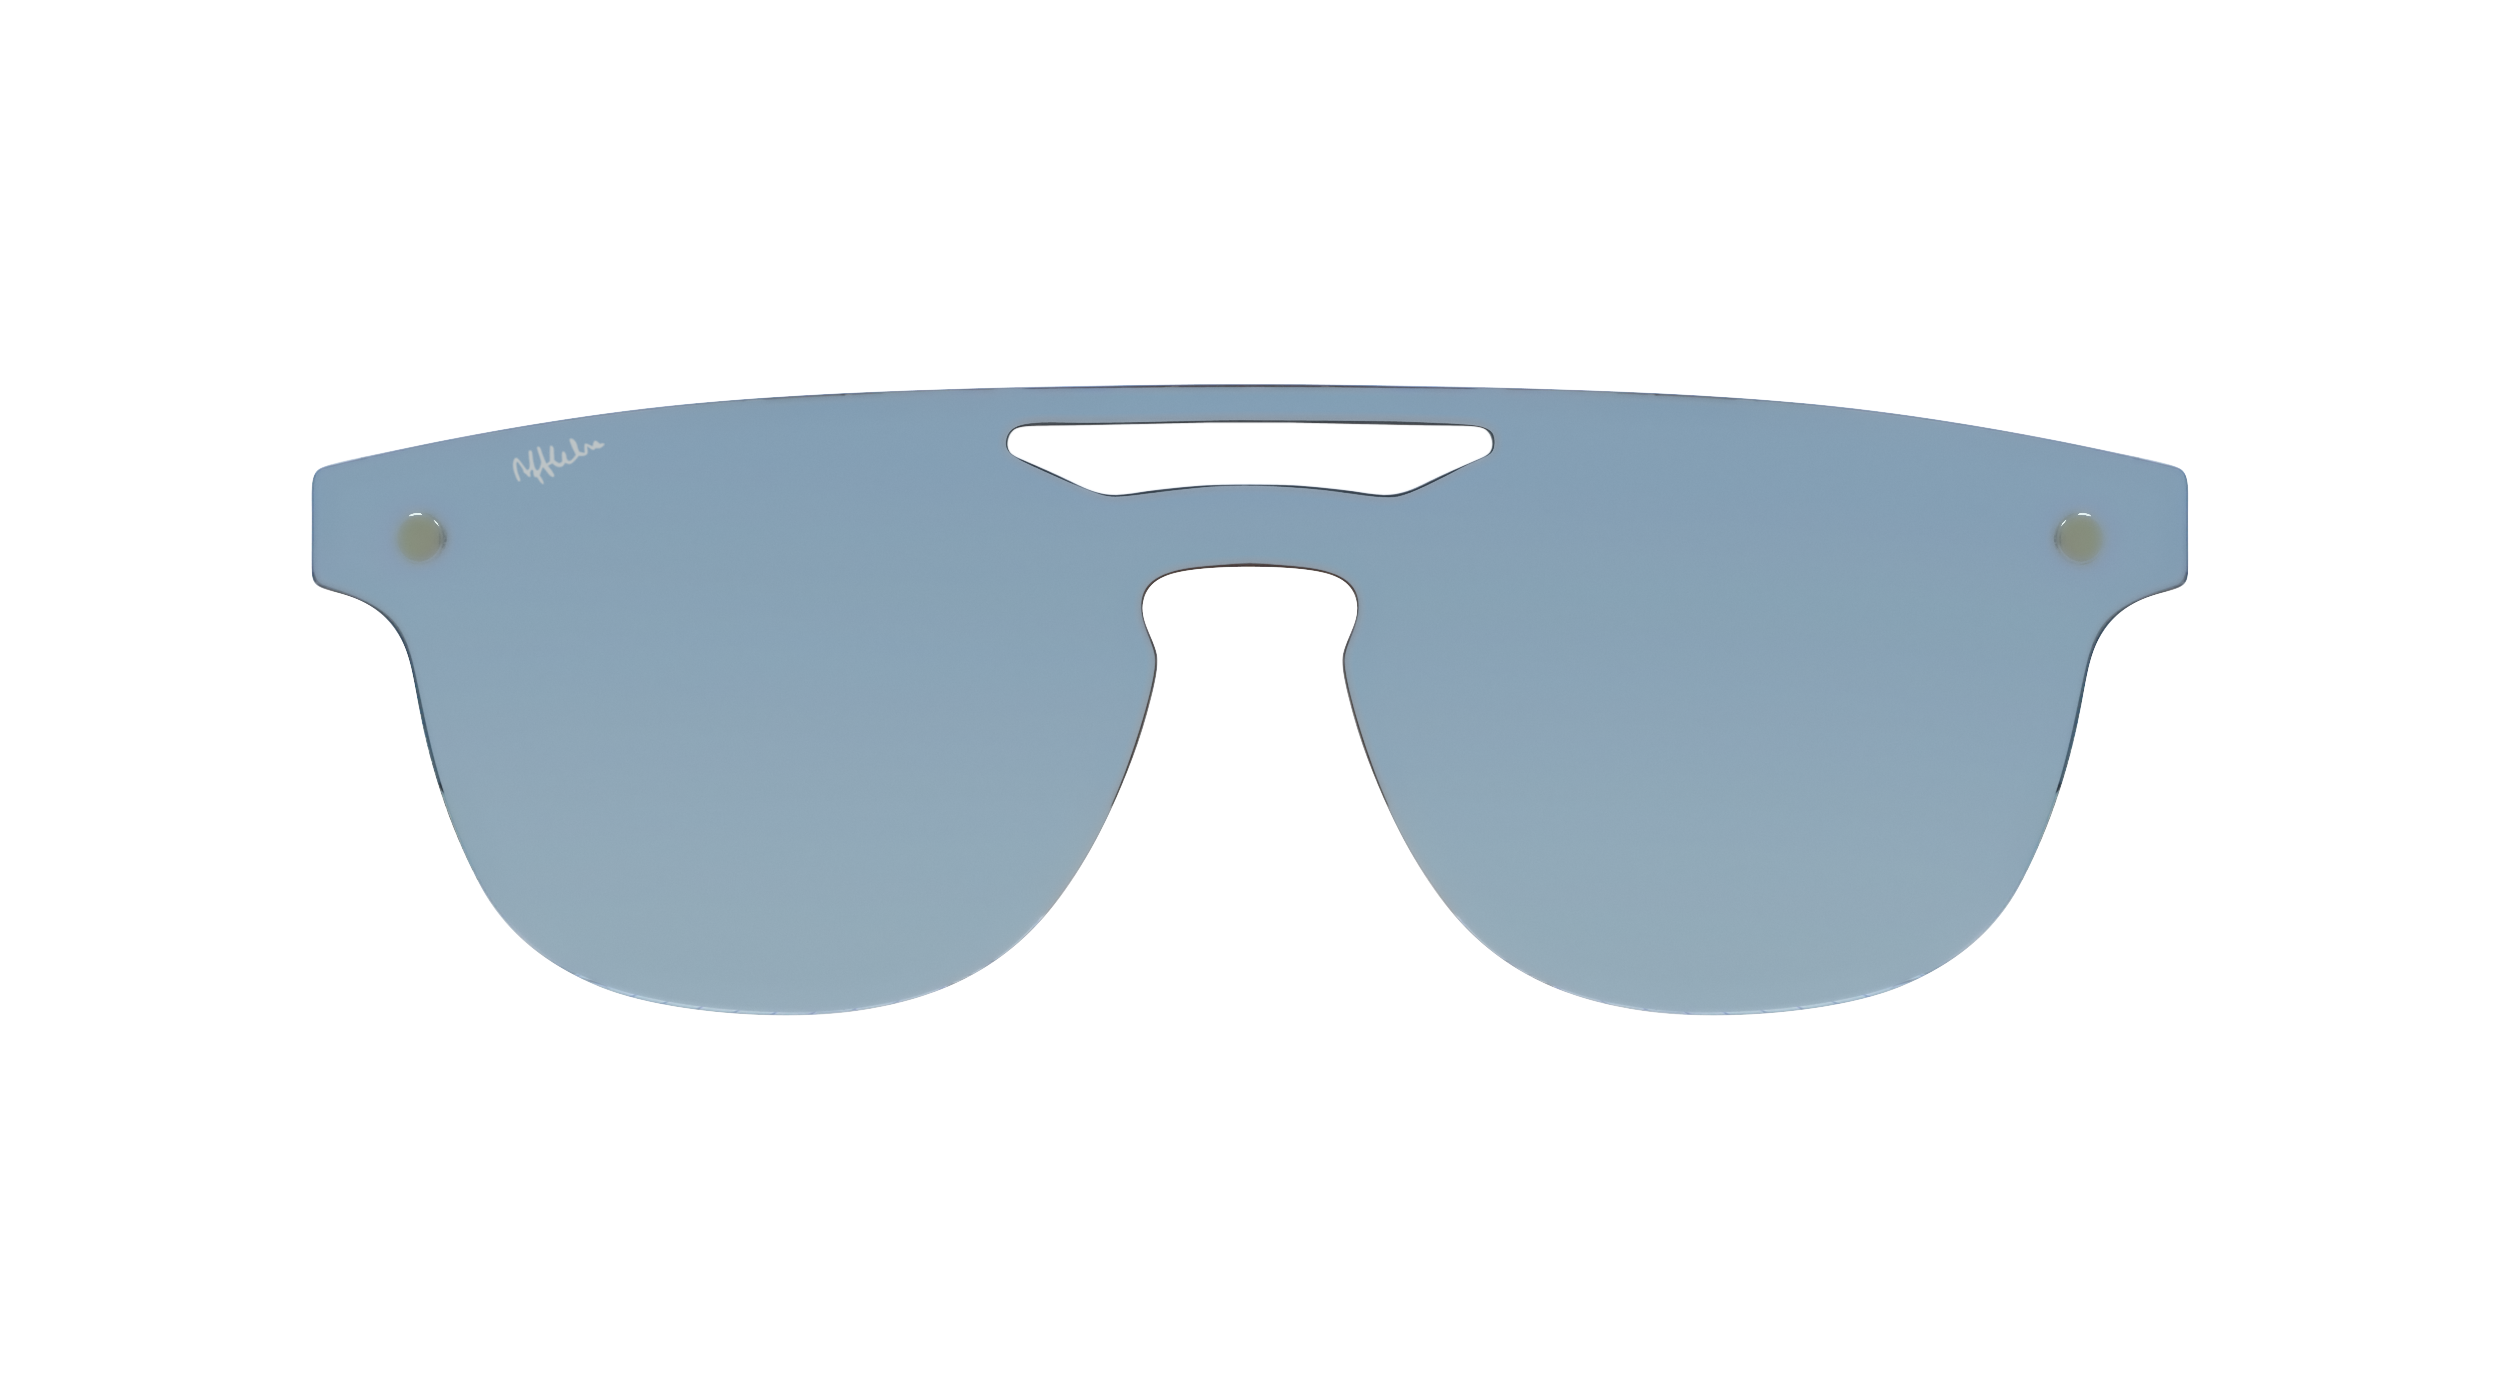 afflelou/france/products/smart_clip/clips_glasses/07630036452653.png